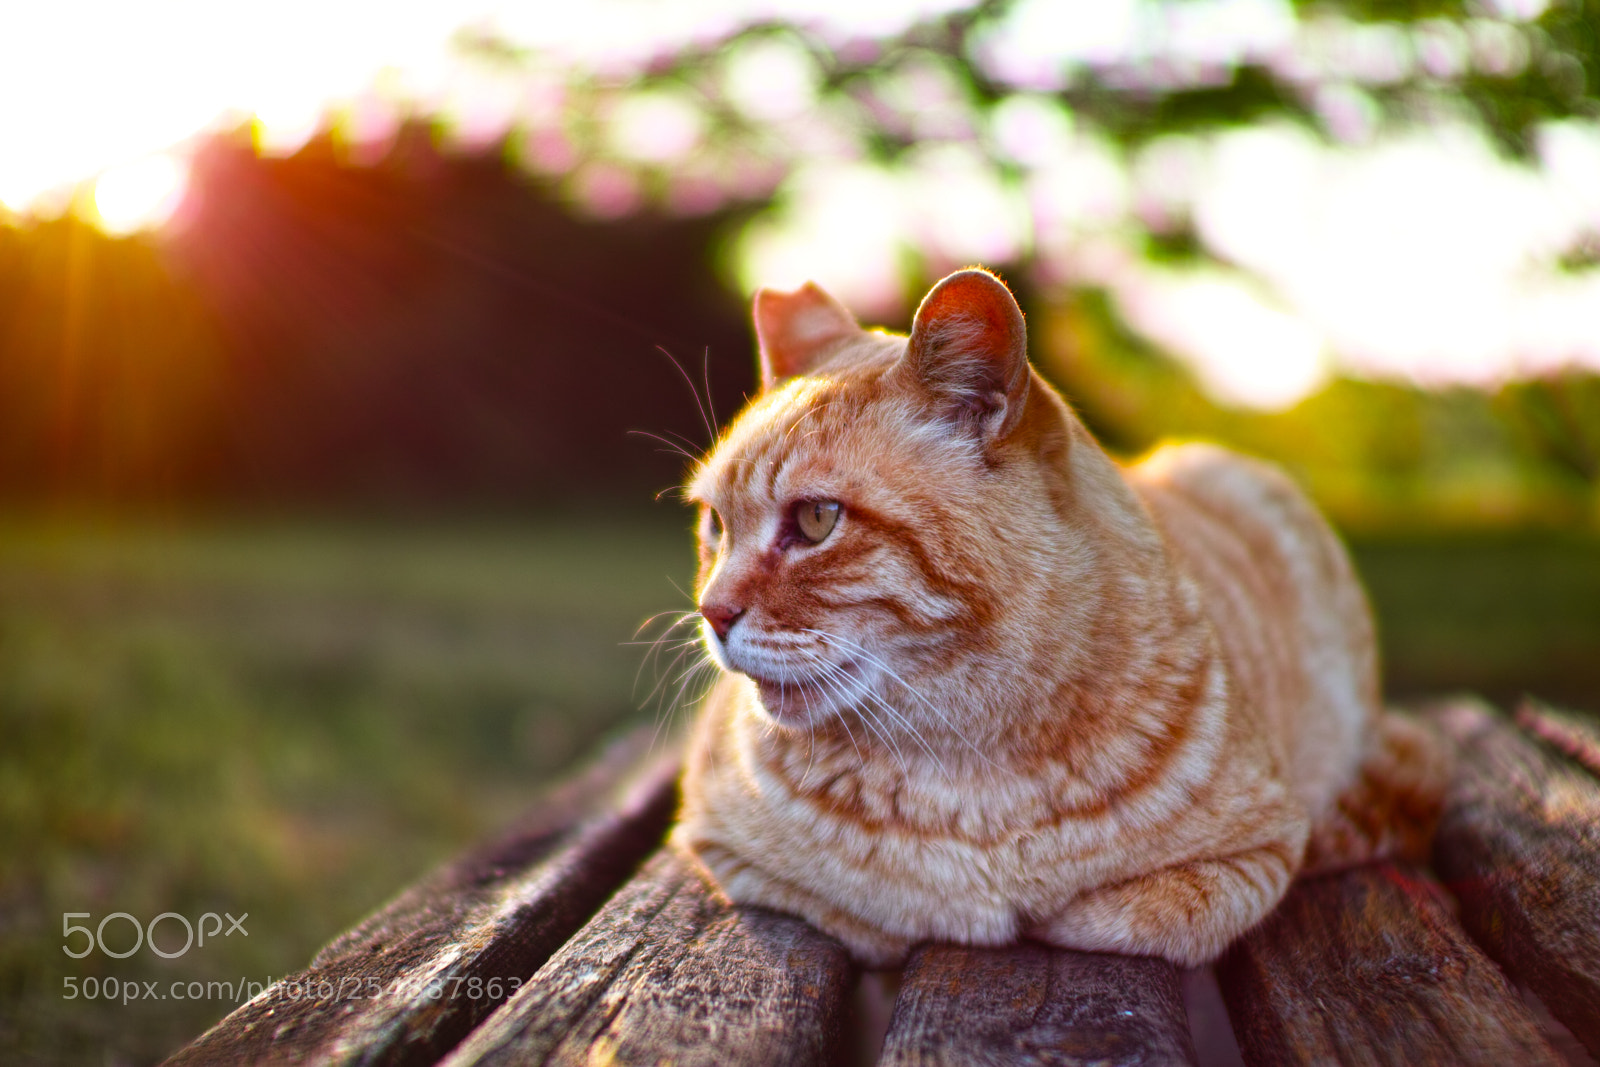 Cat every day, Sigma SD1 MERRILL, Sigma 30mm F1.4 EX DC HSM